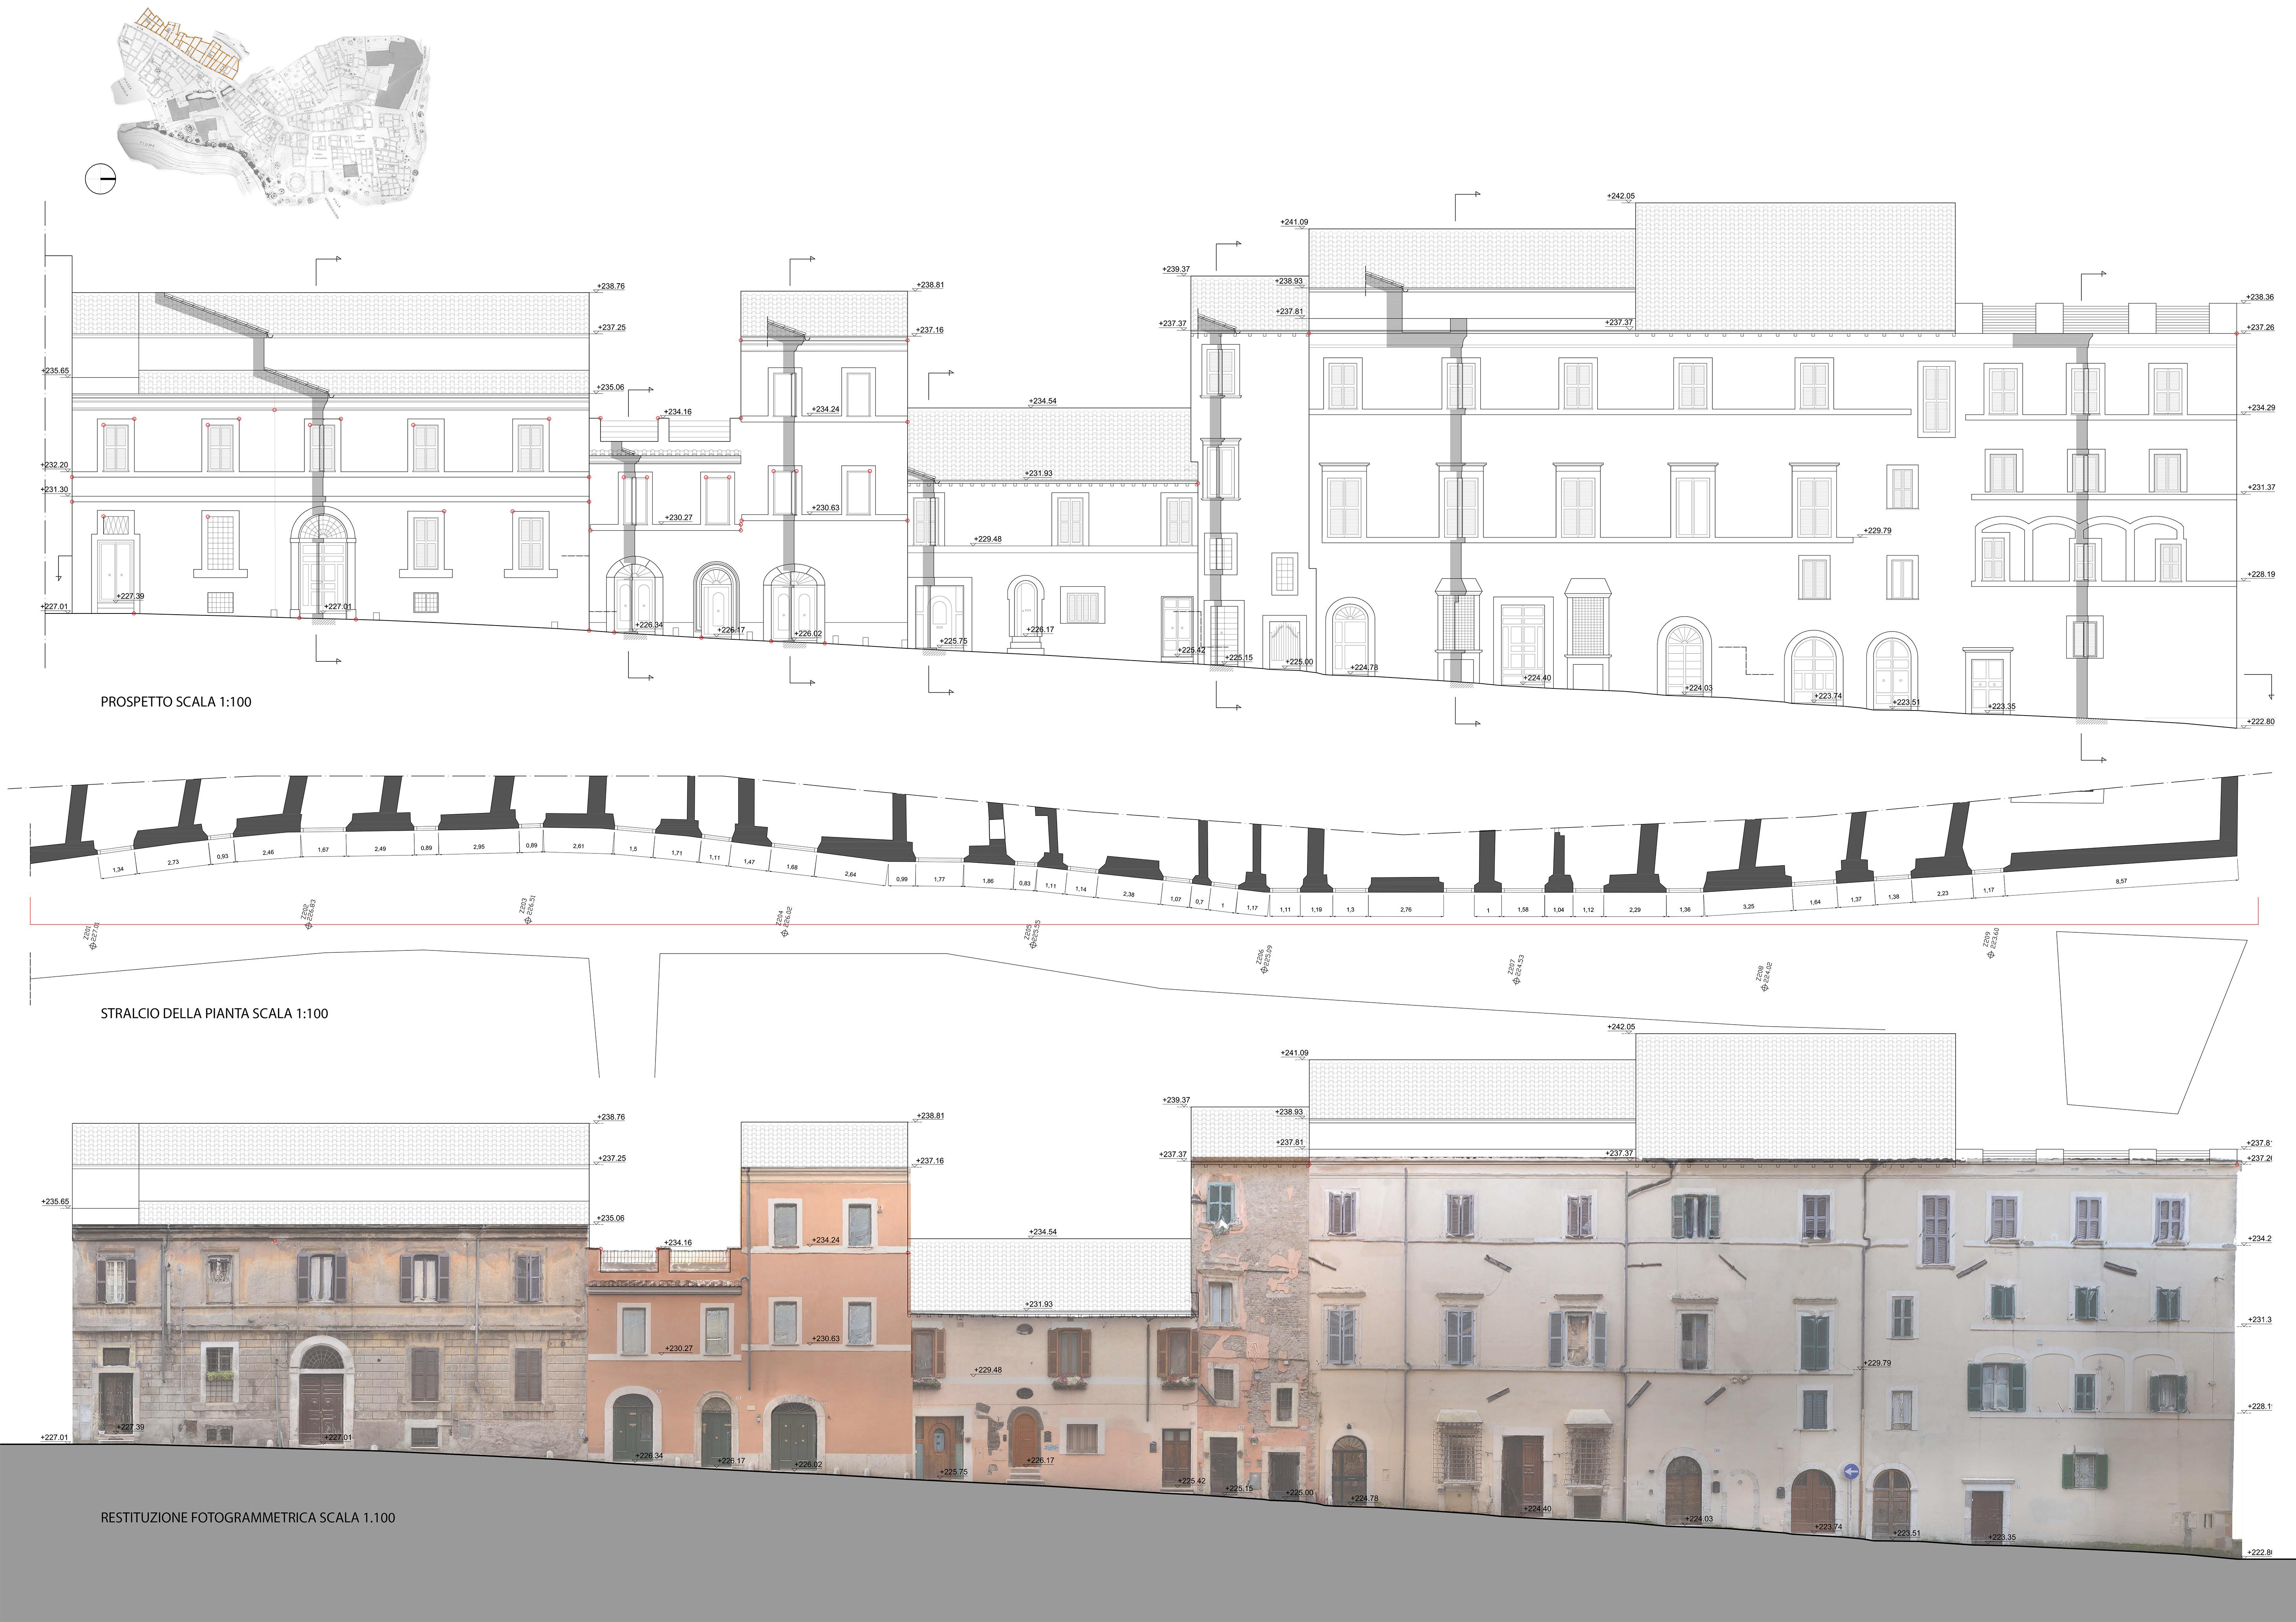 Rilievo e analisi tivoli 1 architettura design for Architettura design